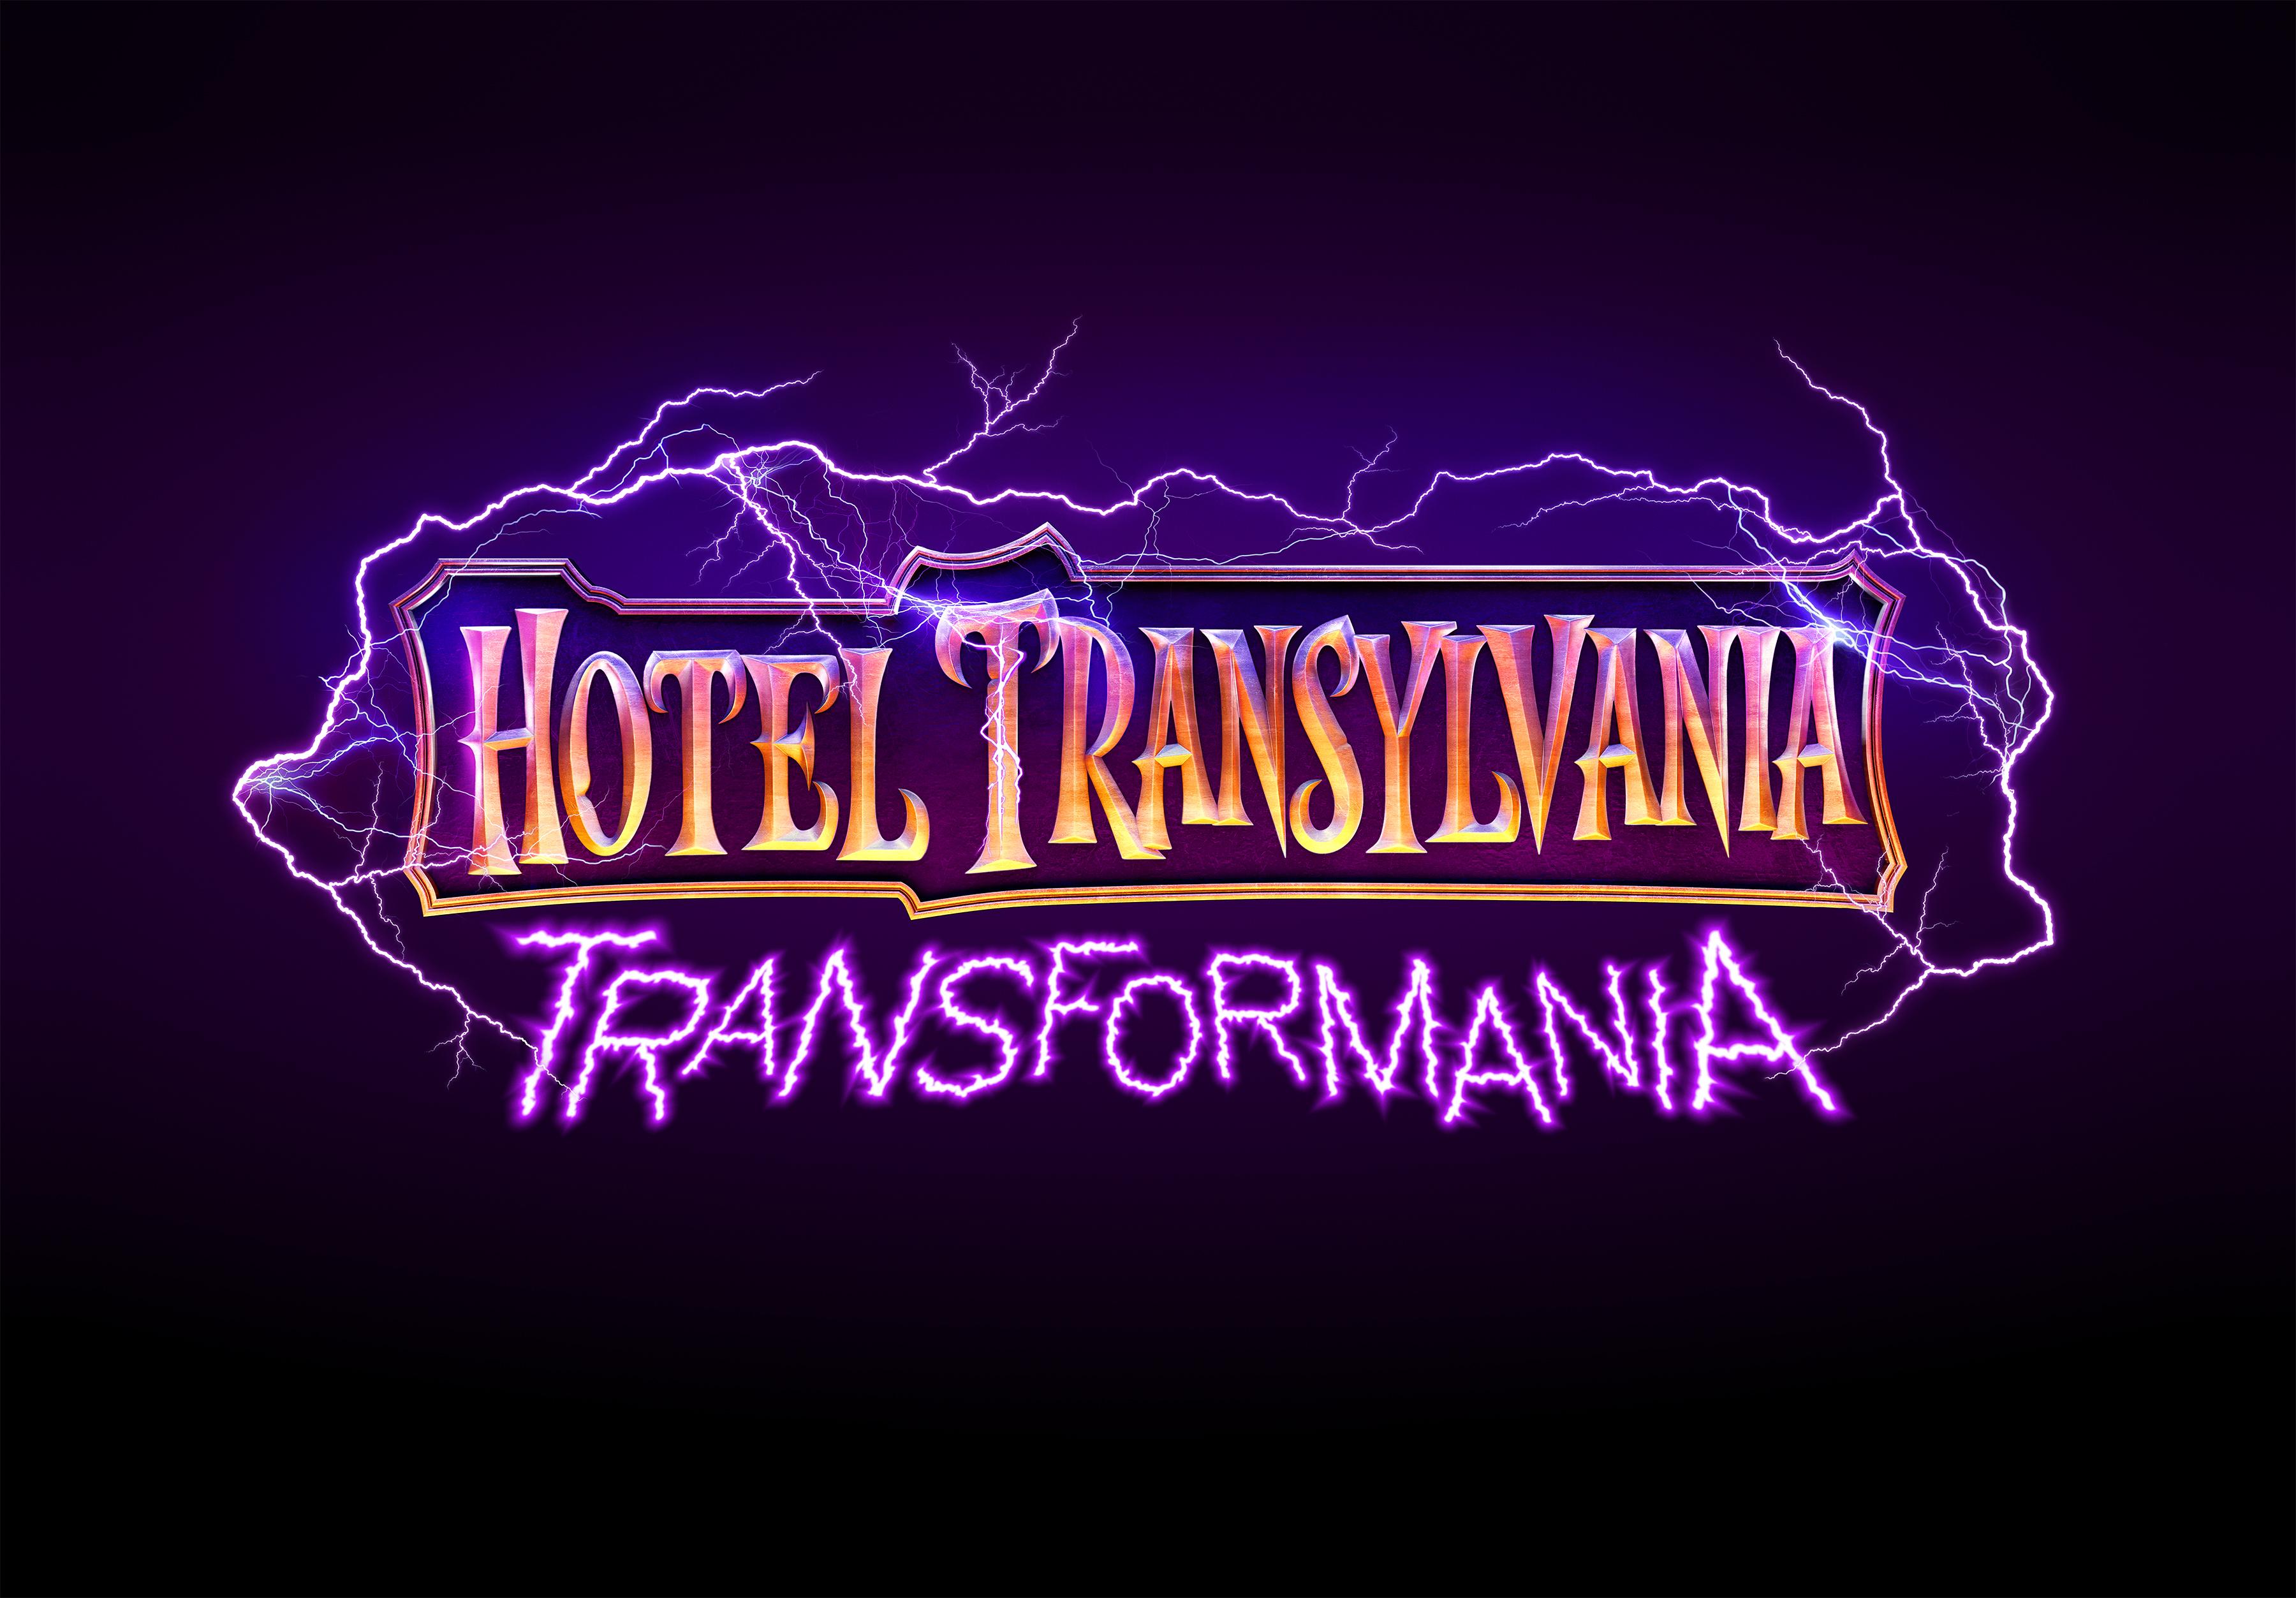 'Hotel Transylvania: Transformania' Heads To The Fall